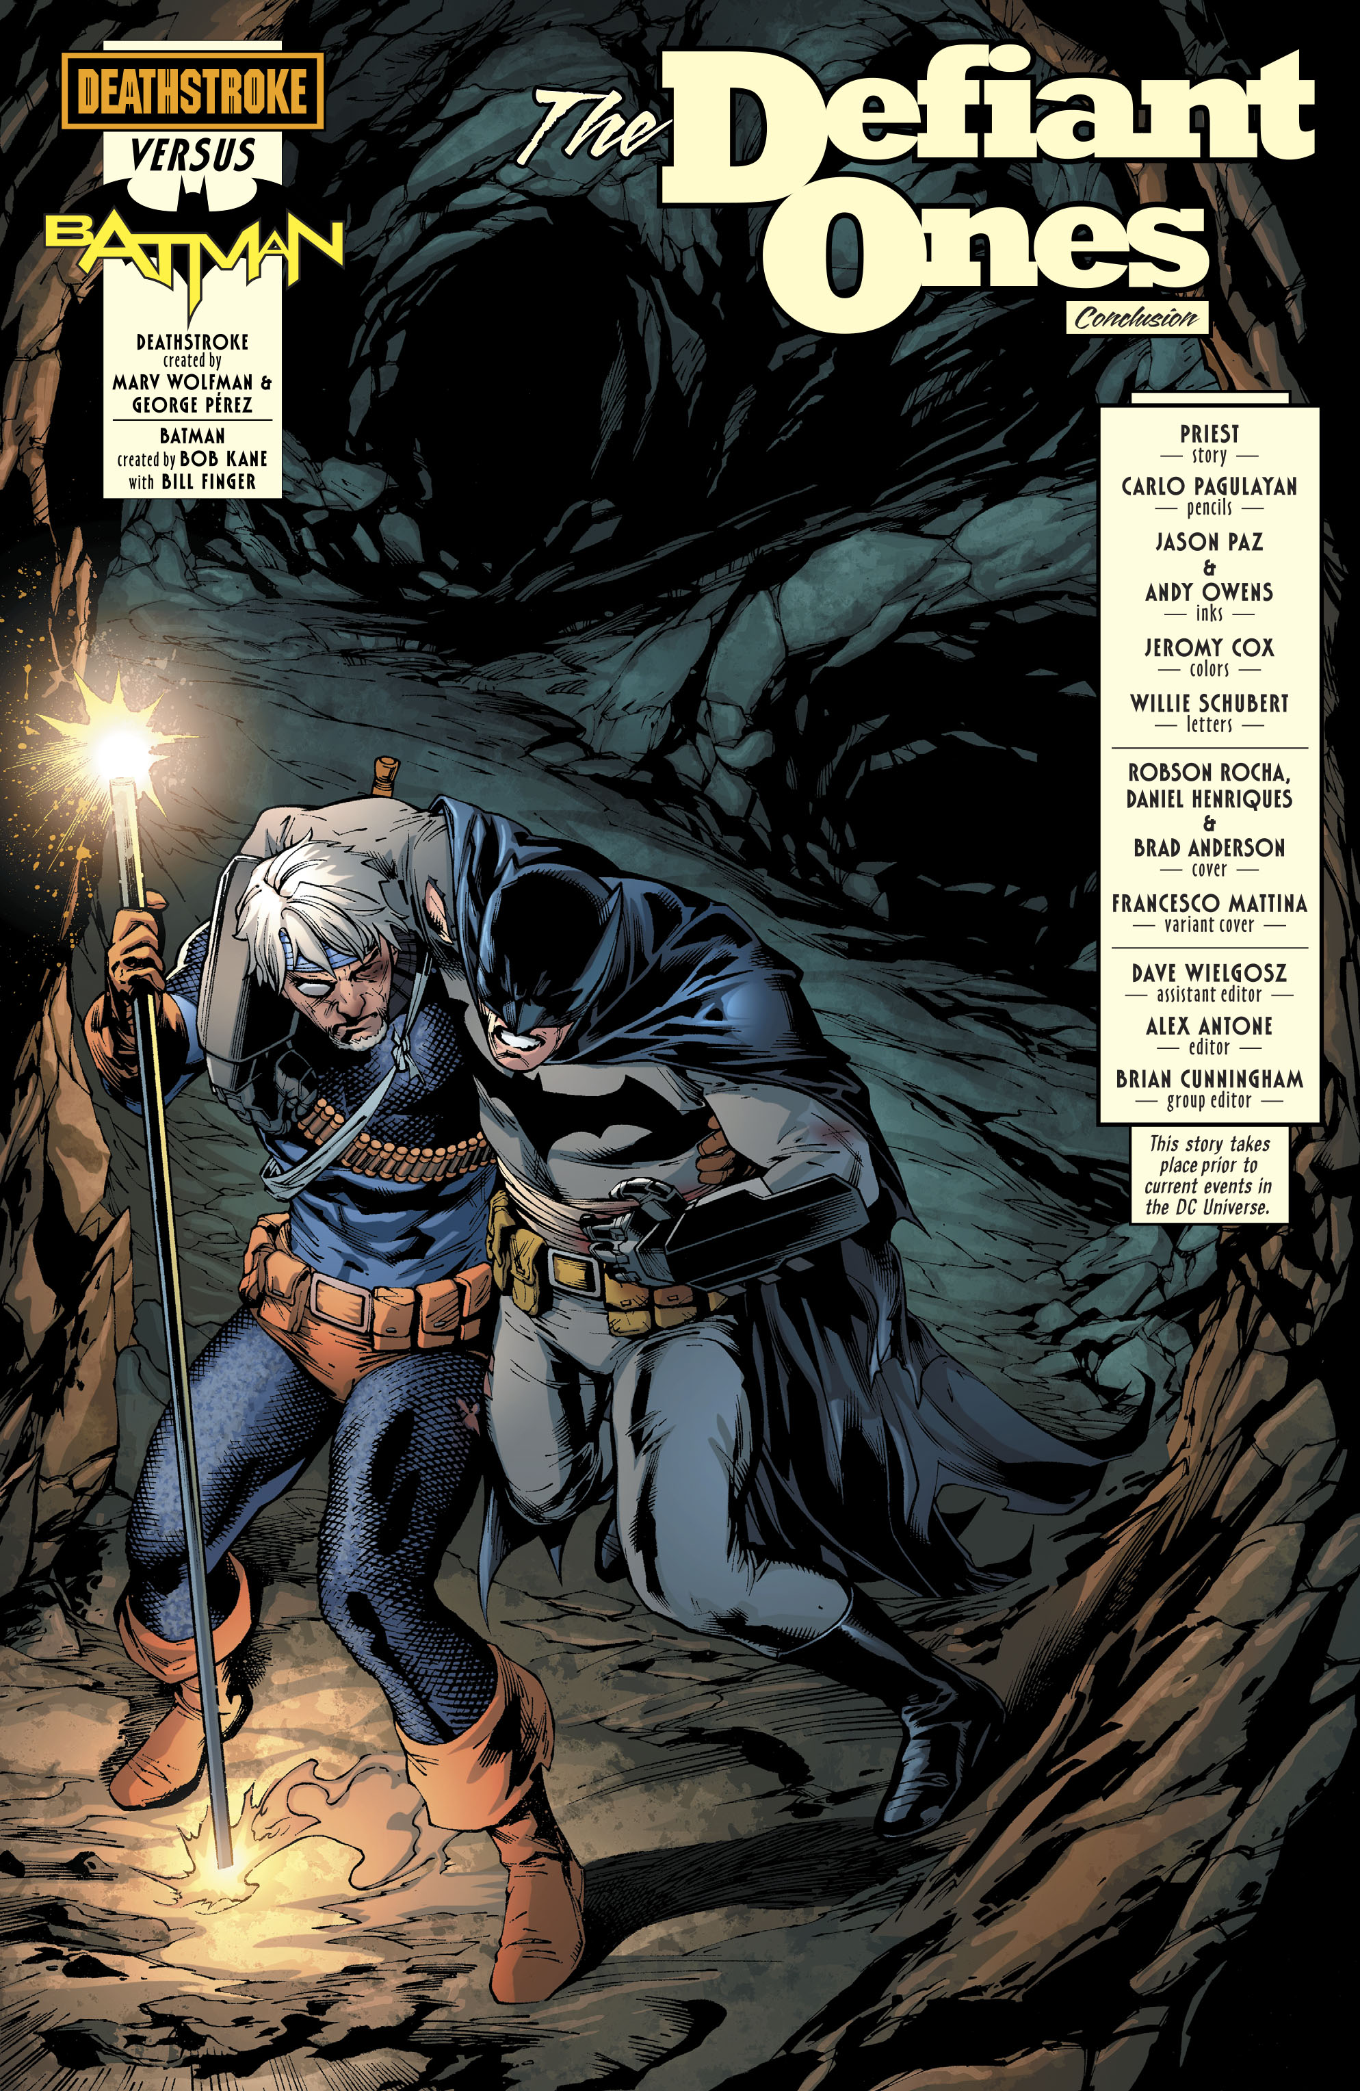 DC Comics Universe & Deathstroke #35 Spoilers: Who Won ...